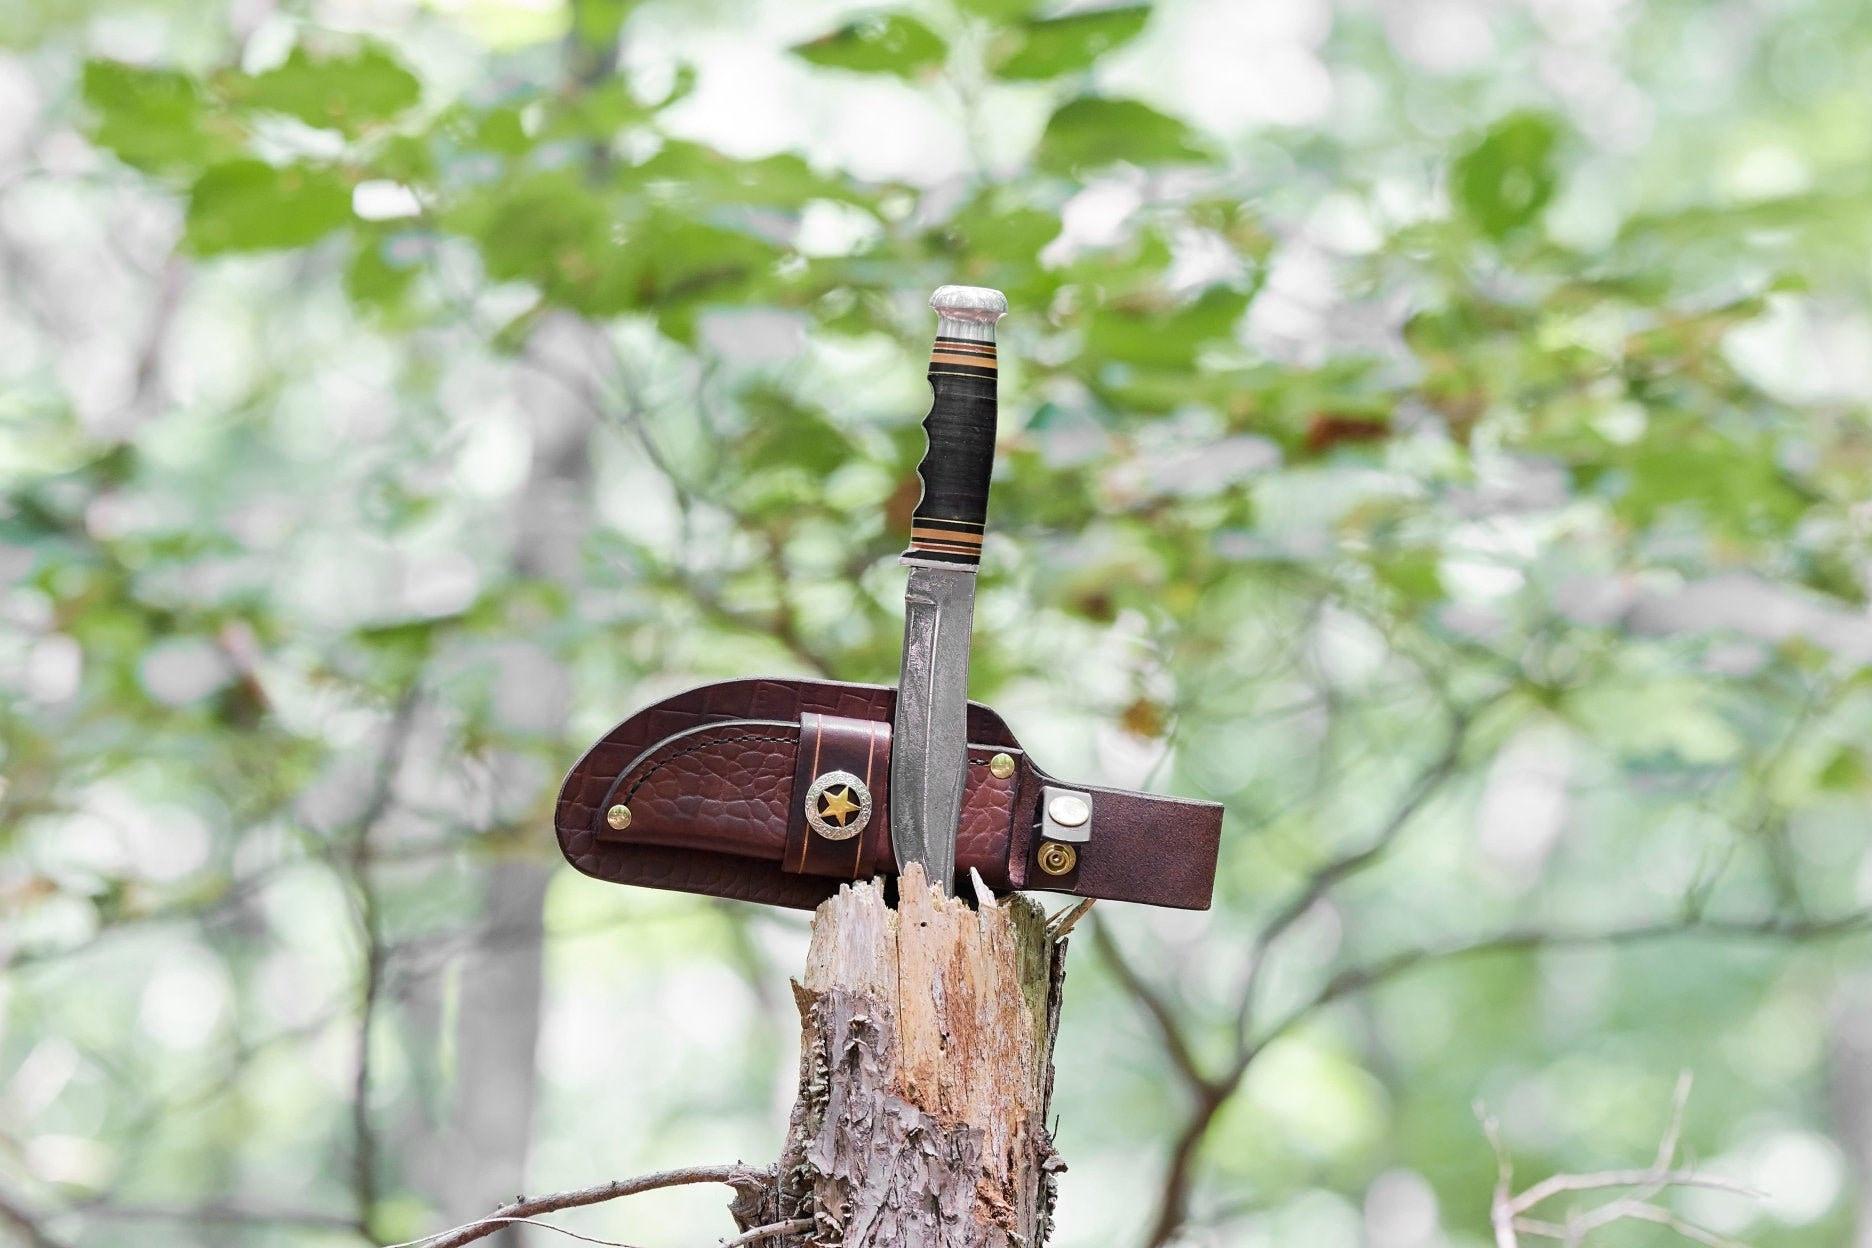 Vintage Kinfolks Fixed Blade knife with custom Leather Sheath